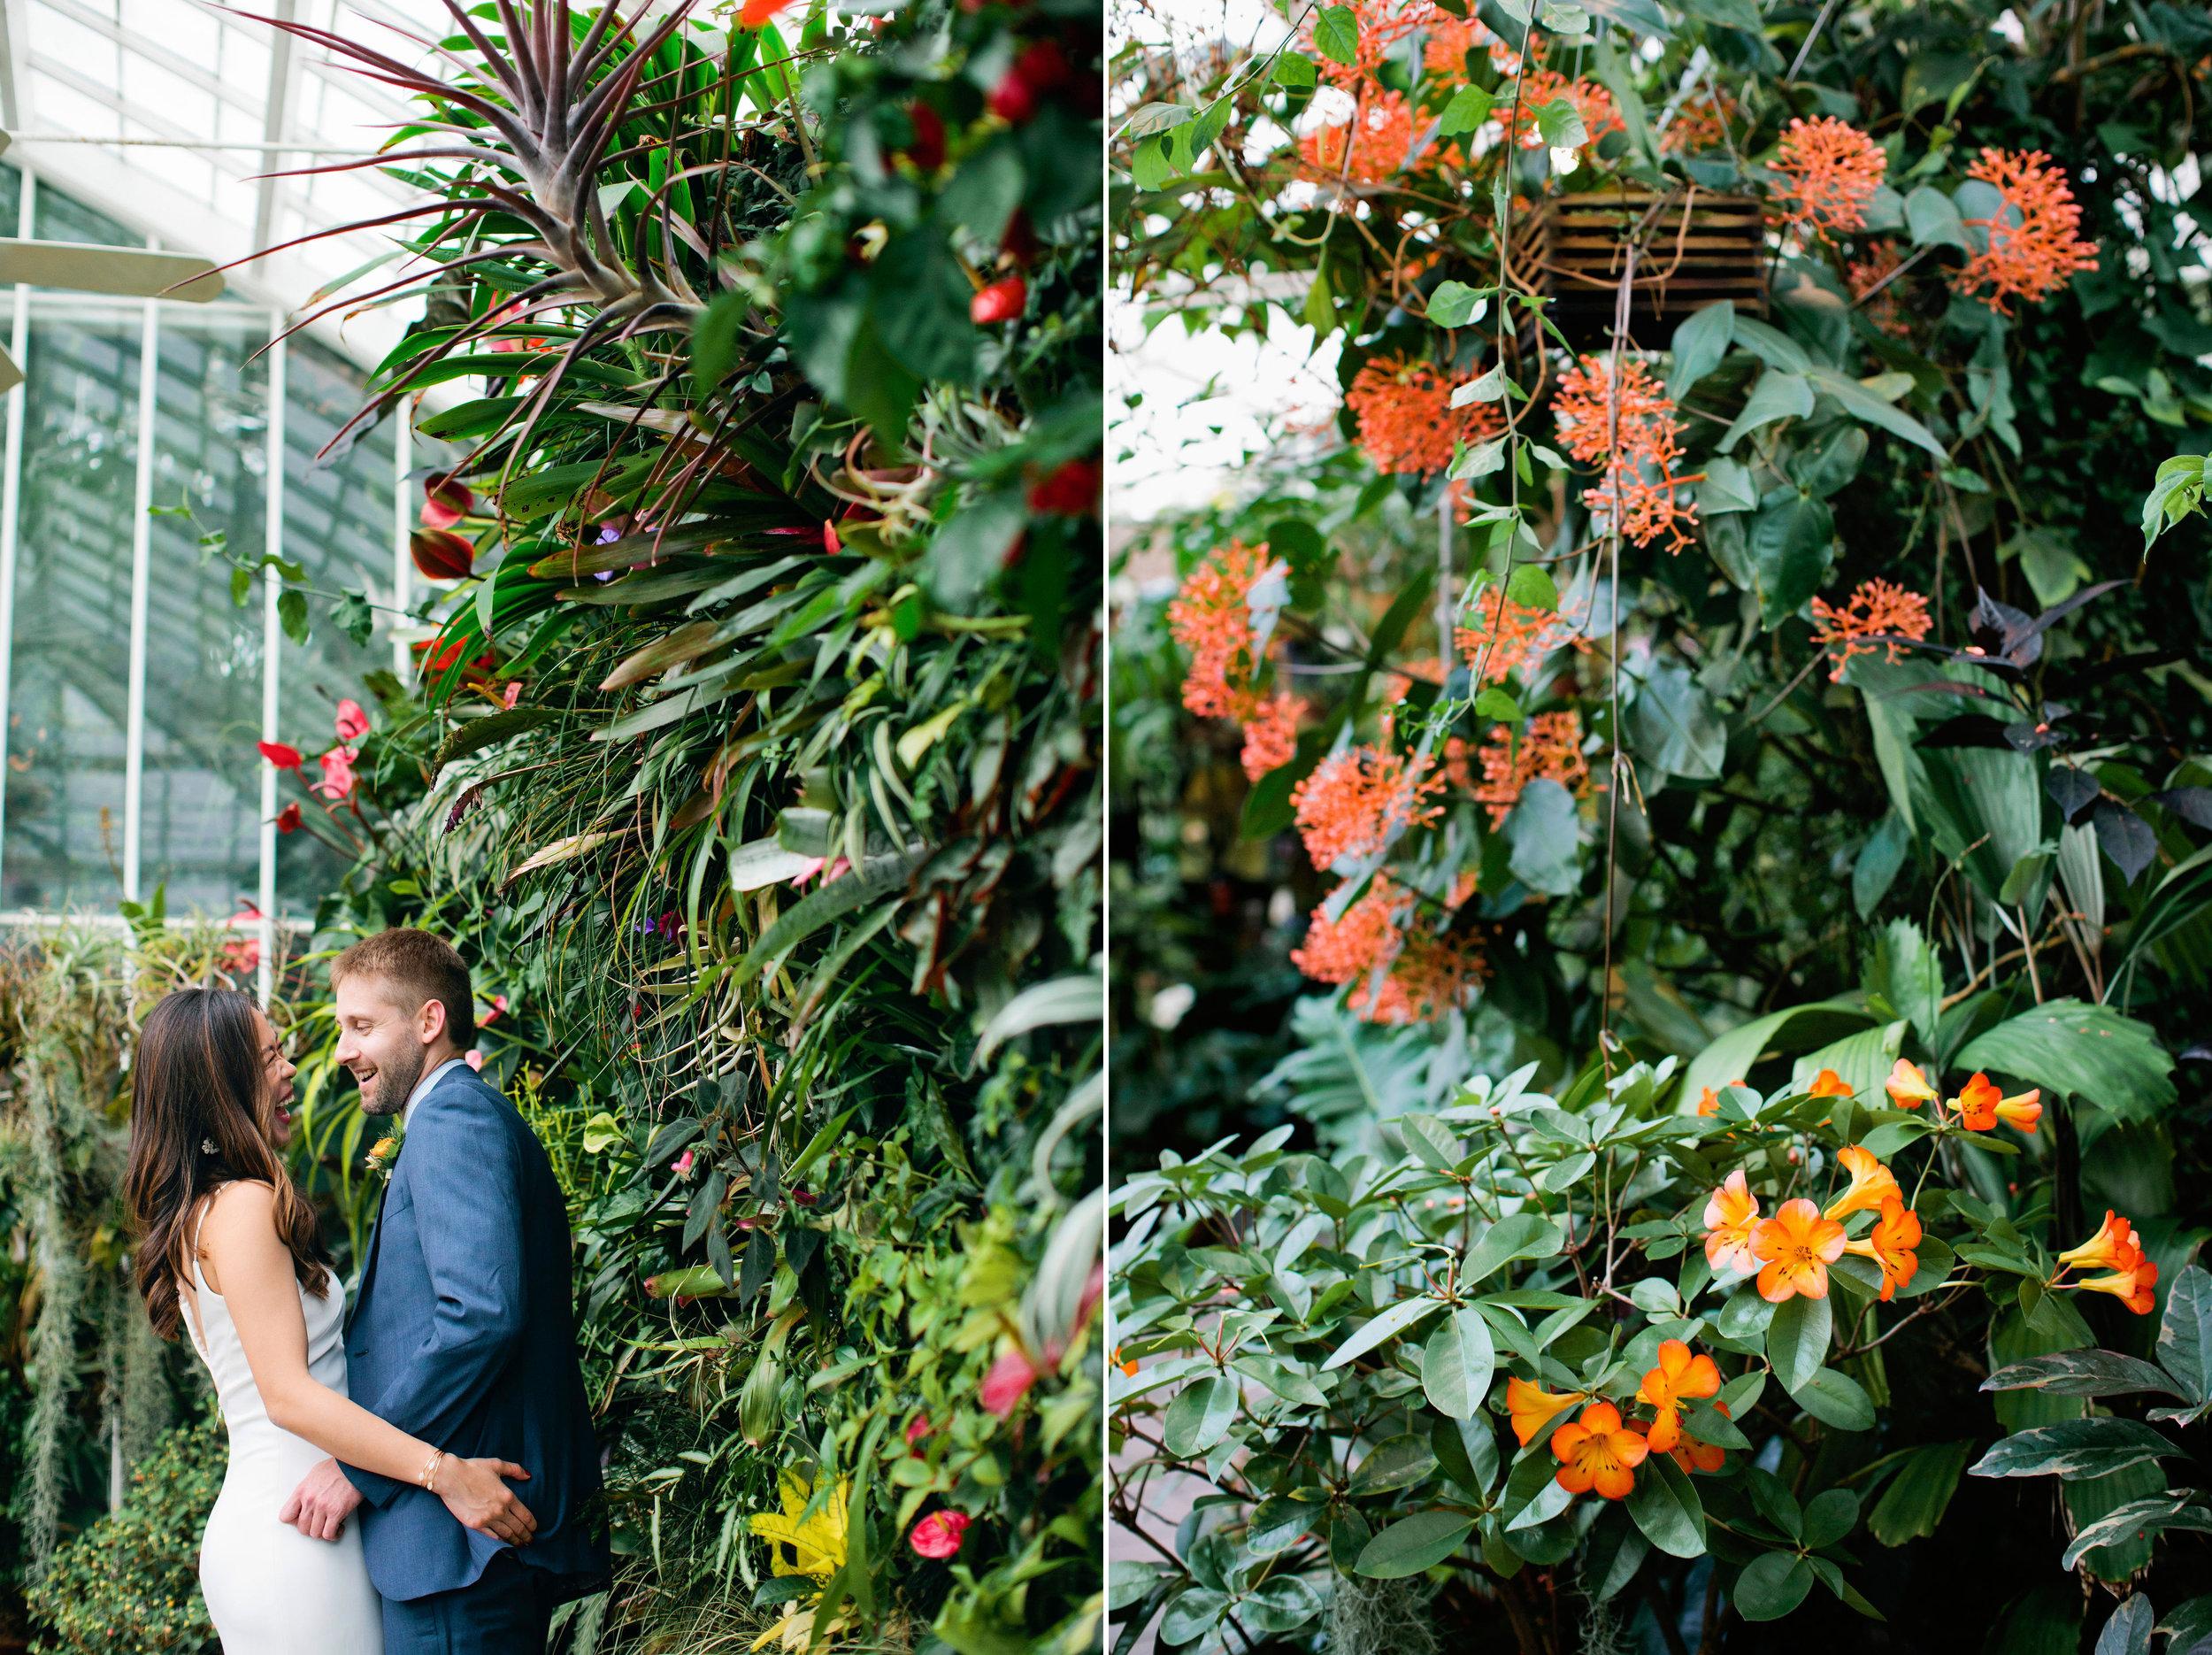 Conservatory-of-Flowers-Wedding-15 copy.jpg